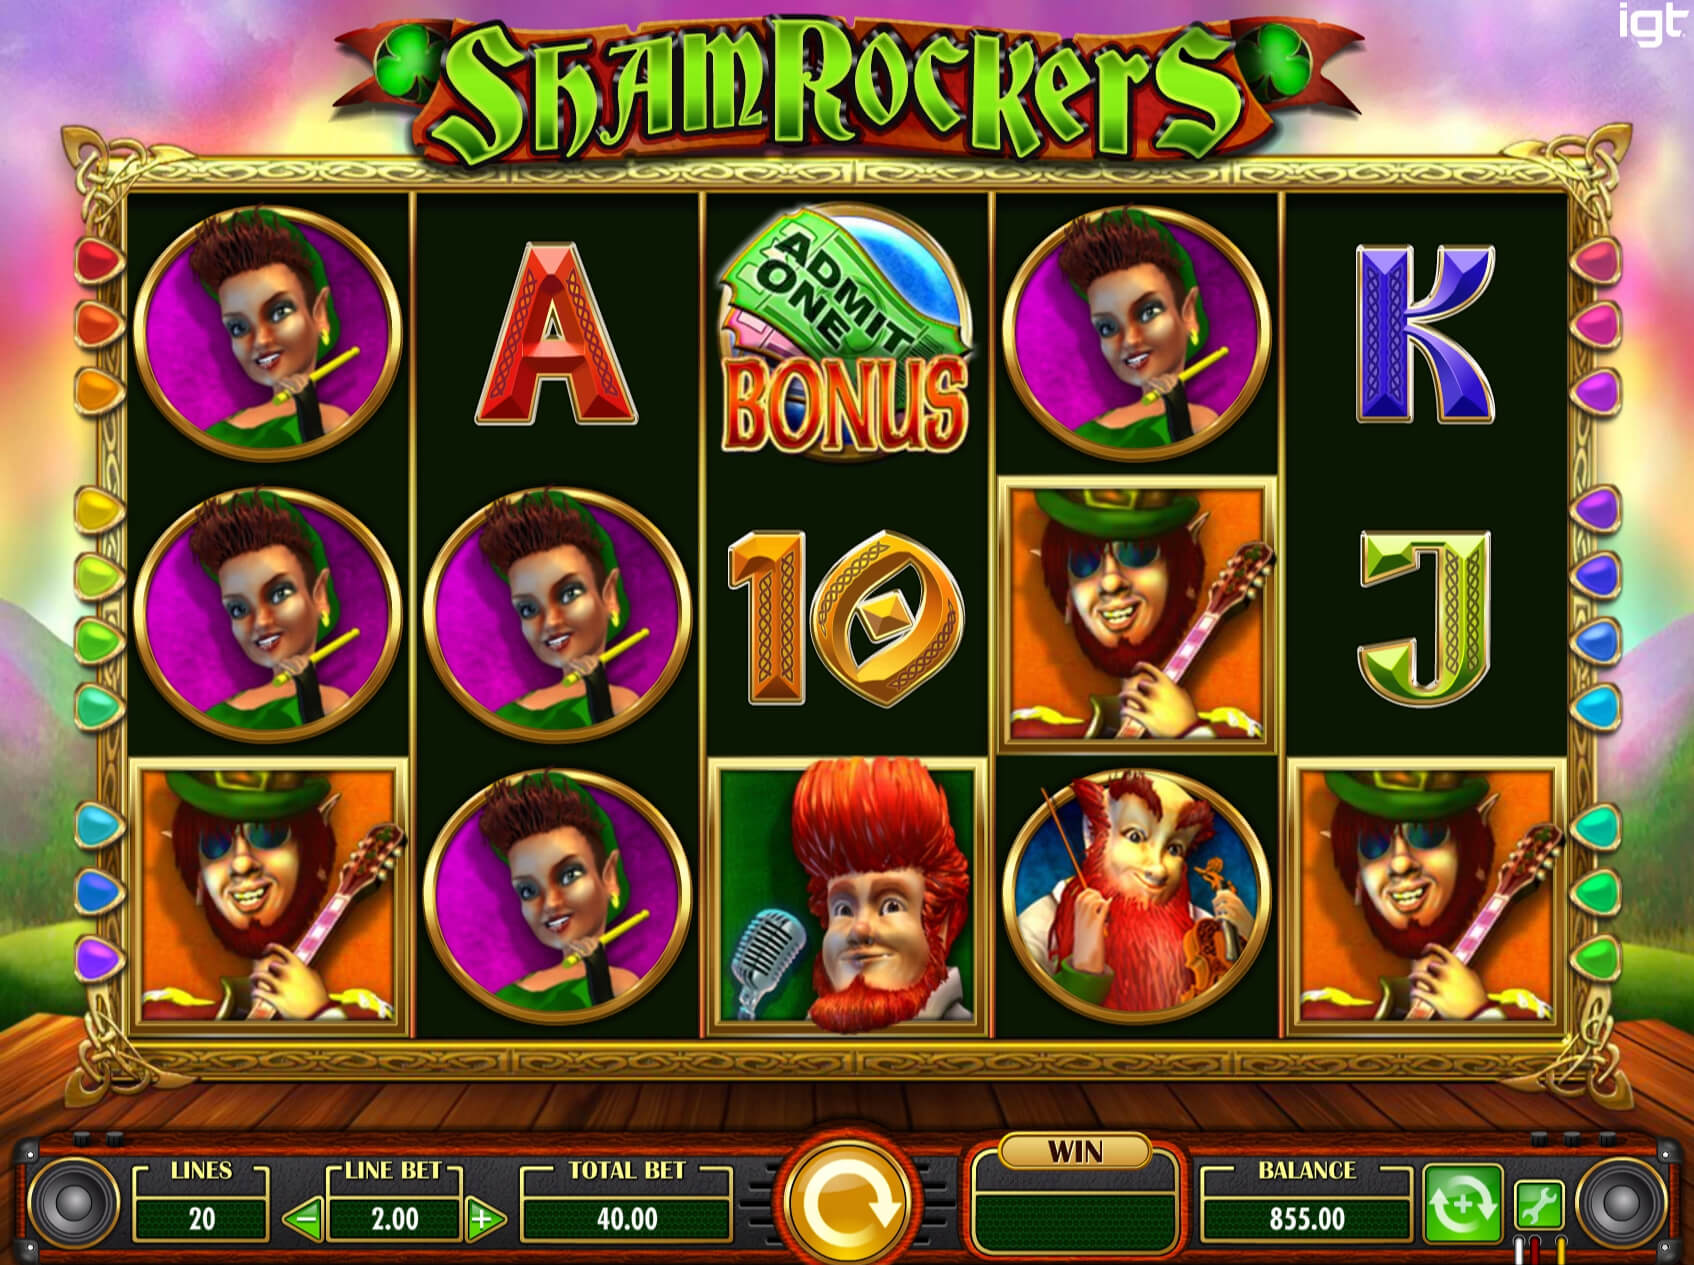 Screenshot from game: Shamrockers